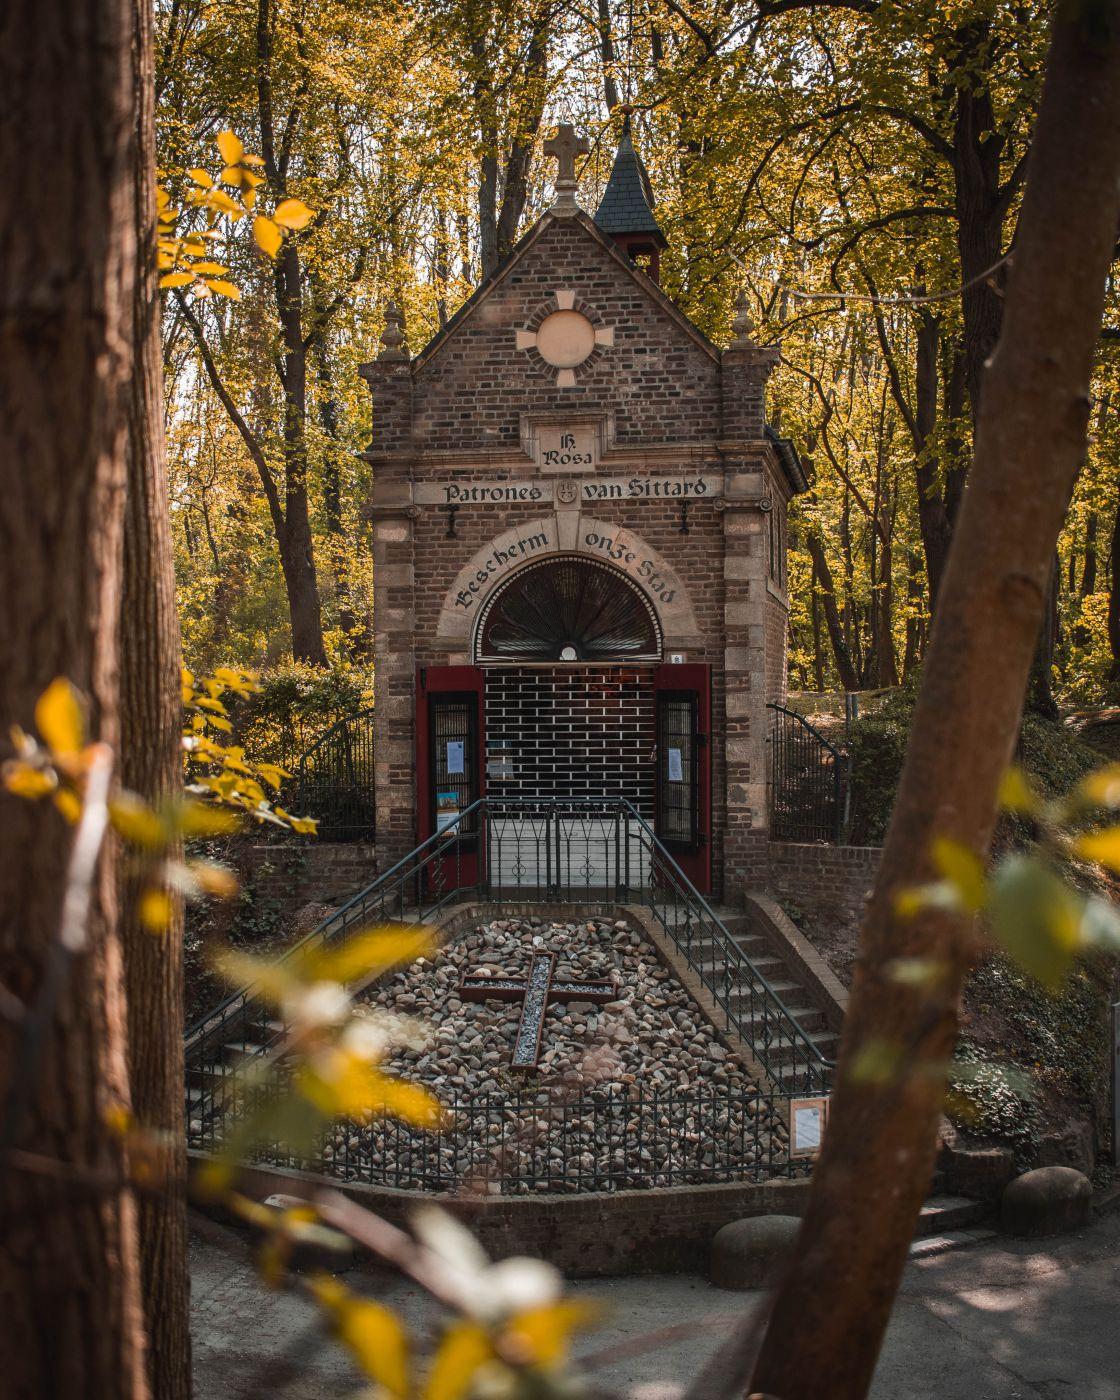 Sint rosa kapel, Netherlands